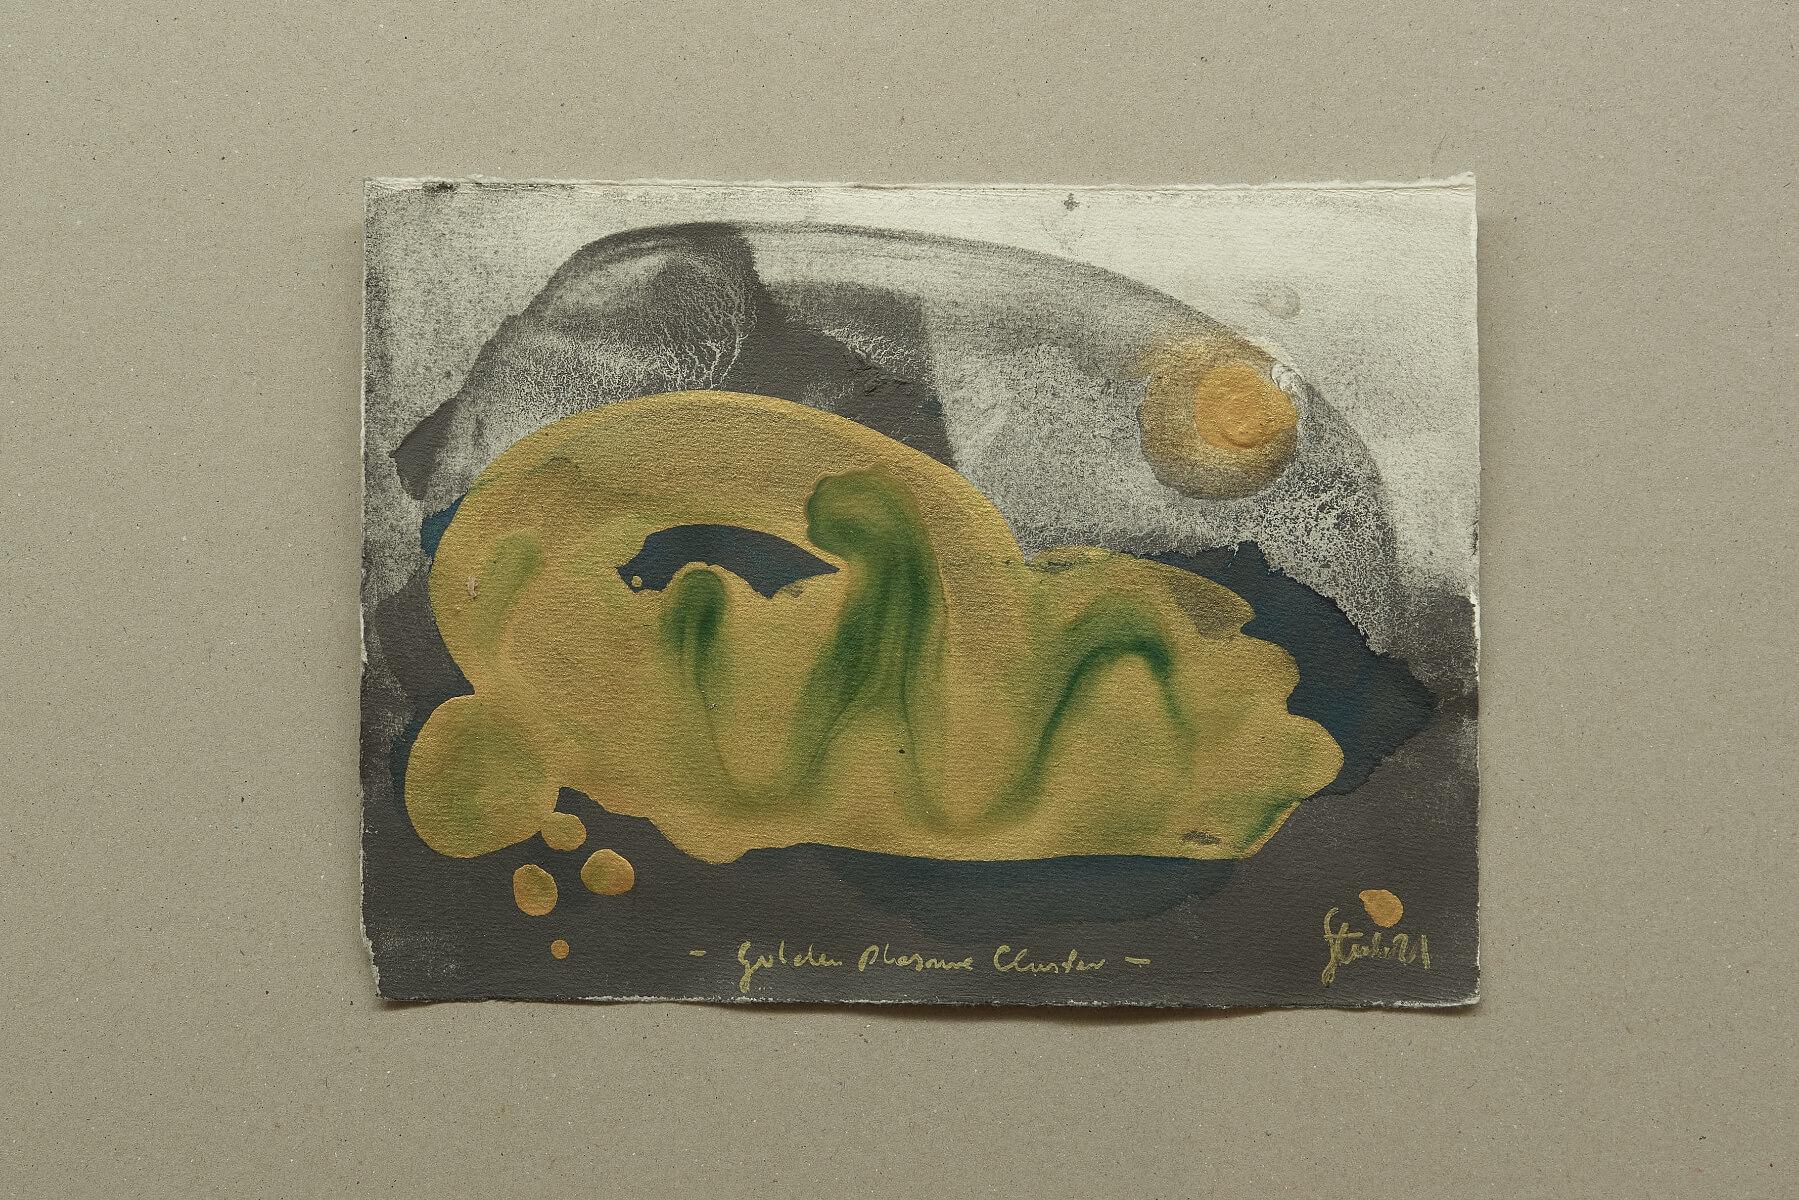 Marianna Stuhr - Golden Pleasure Cluster